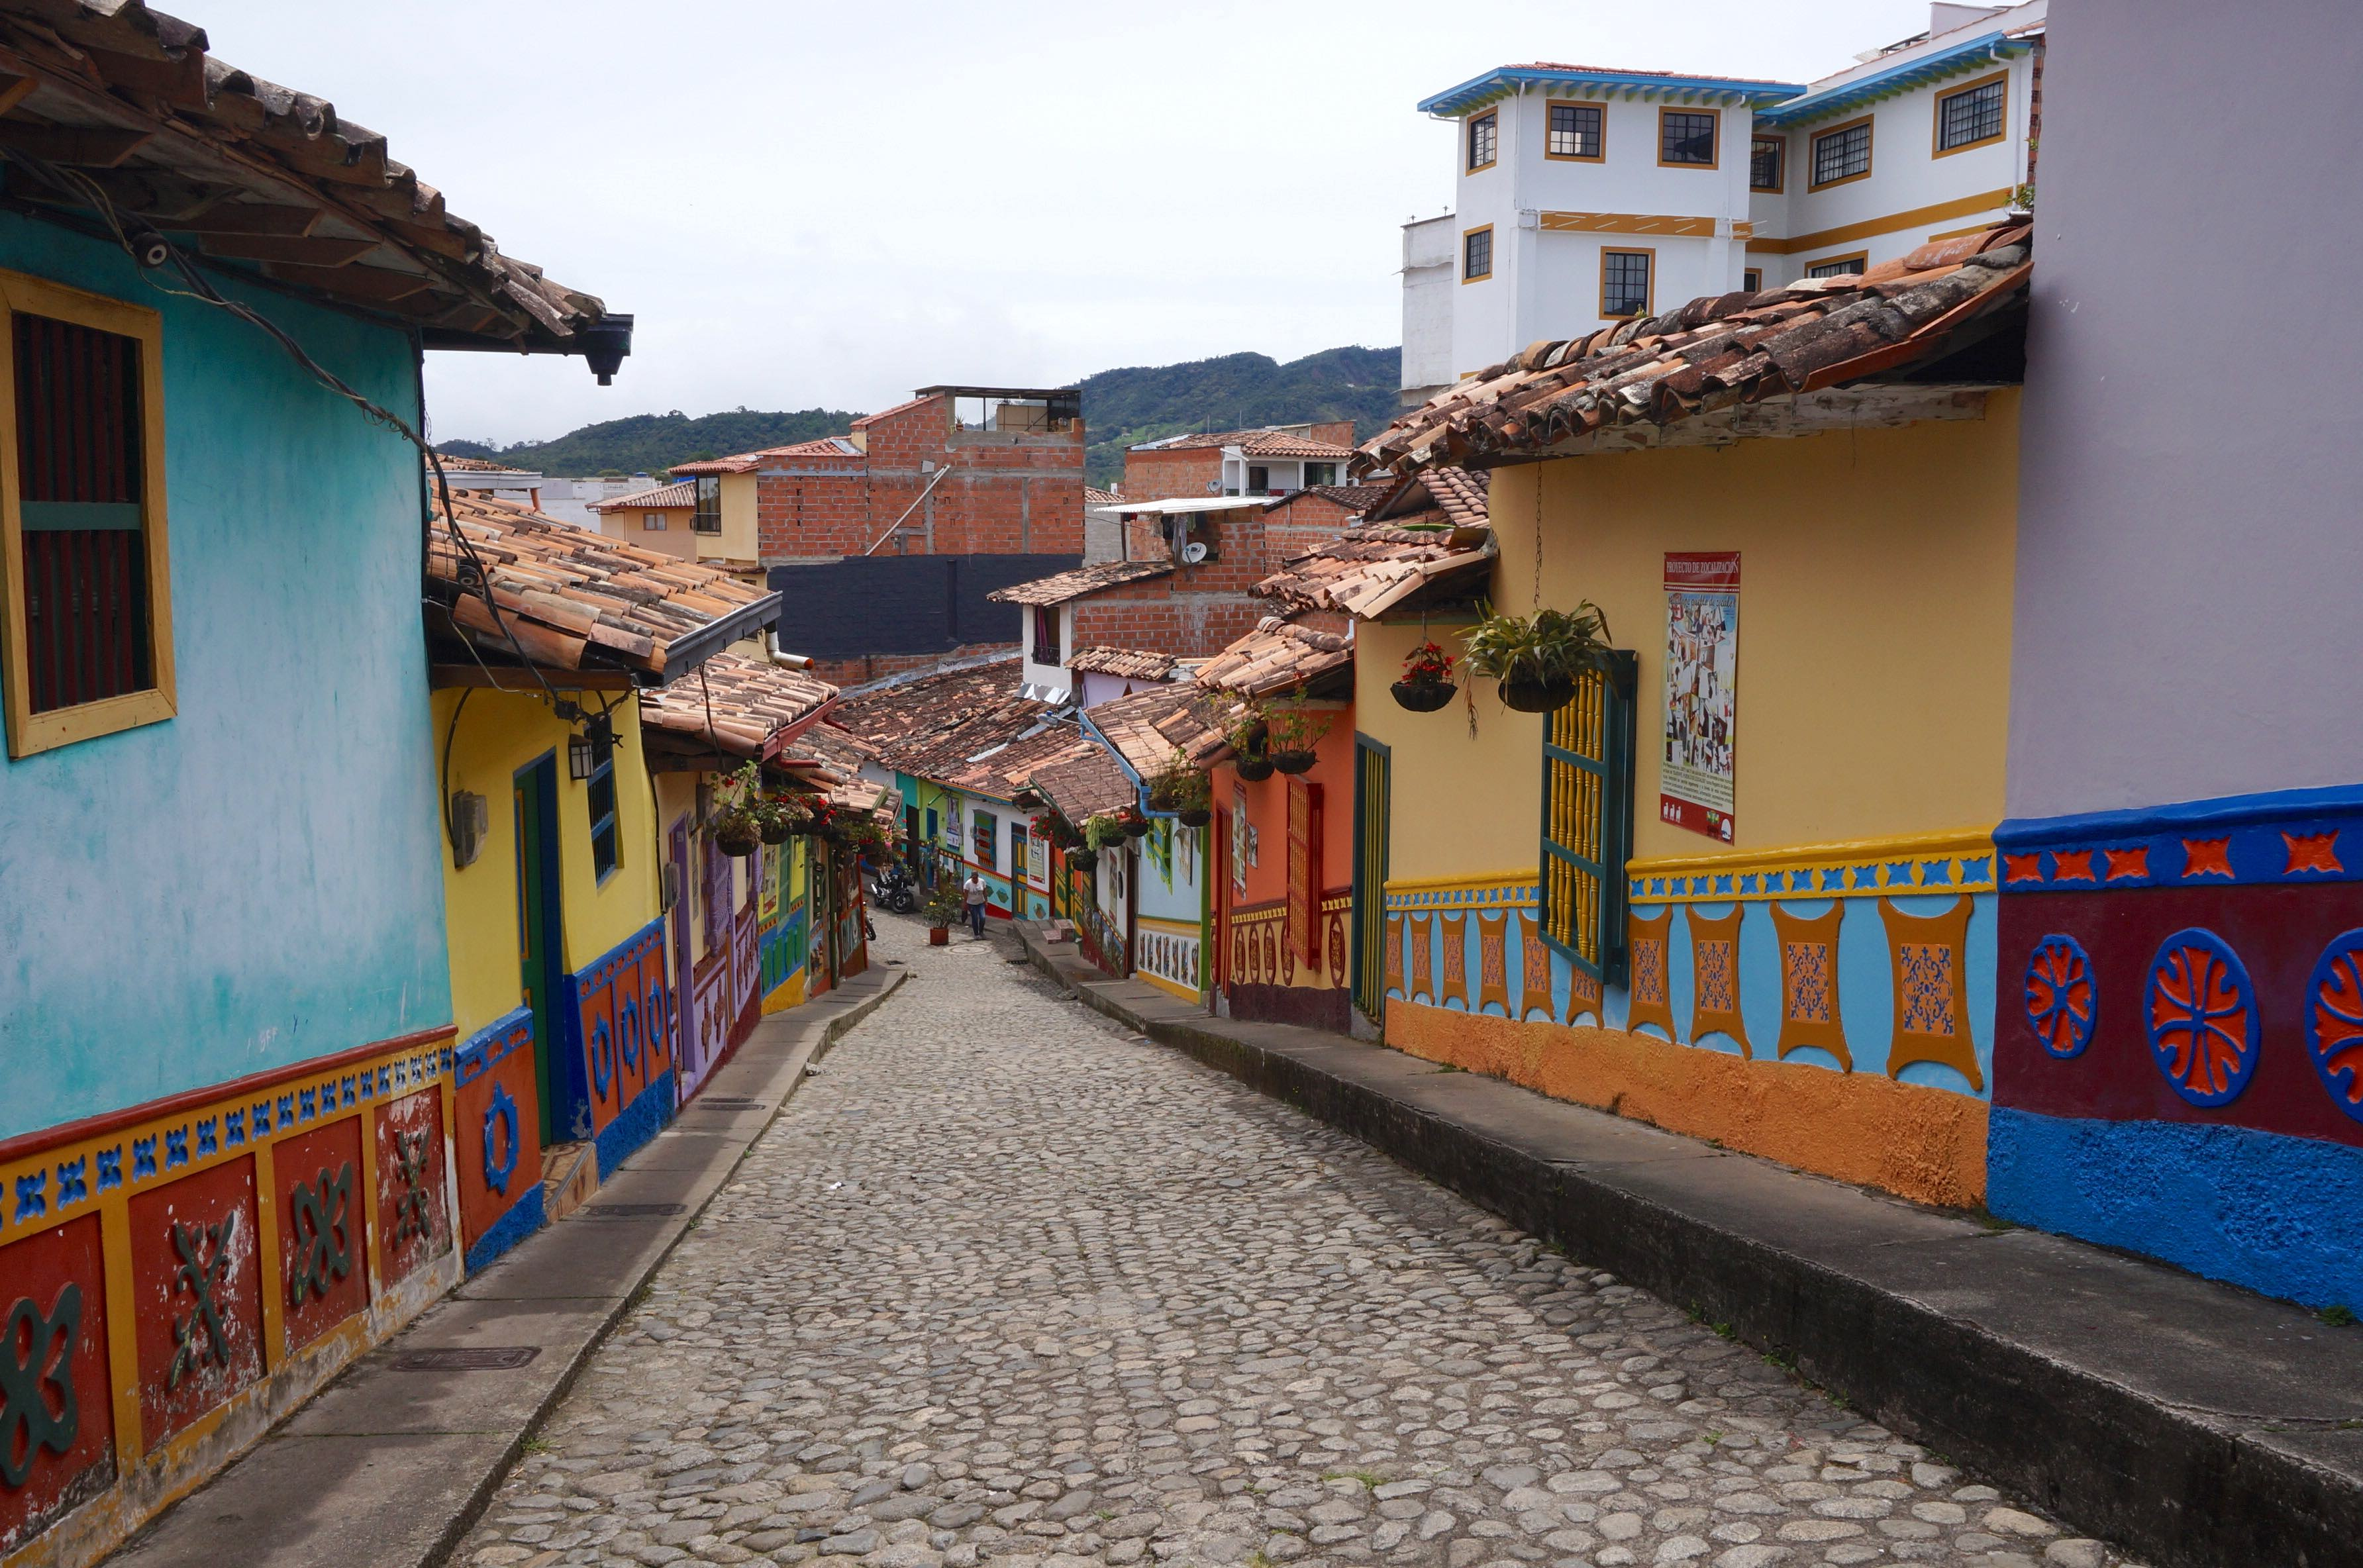 calle del recuerdo, guatapé, colombie